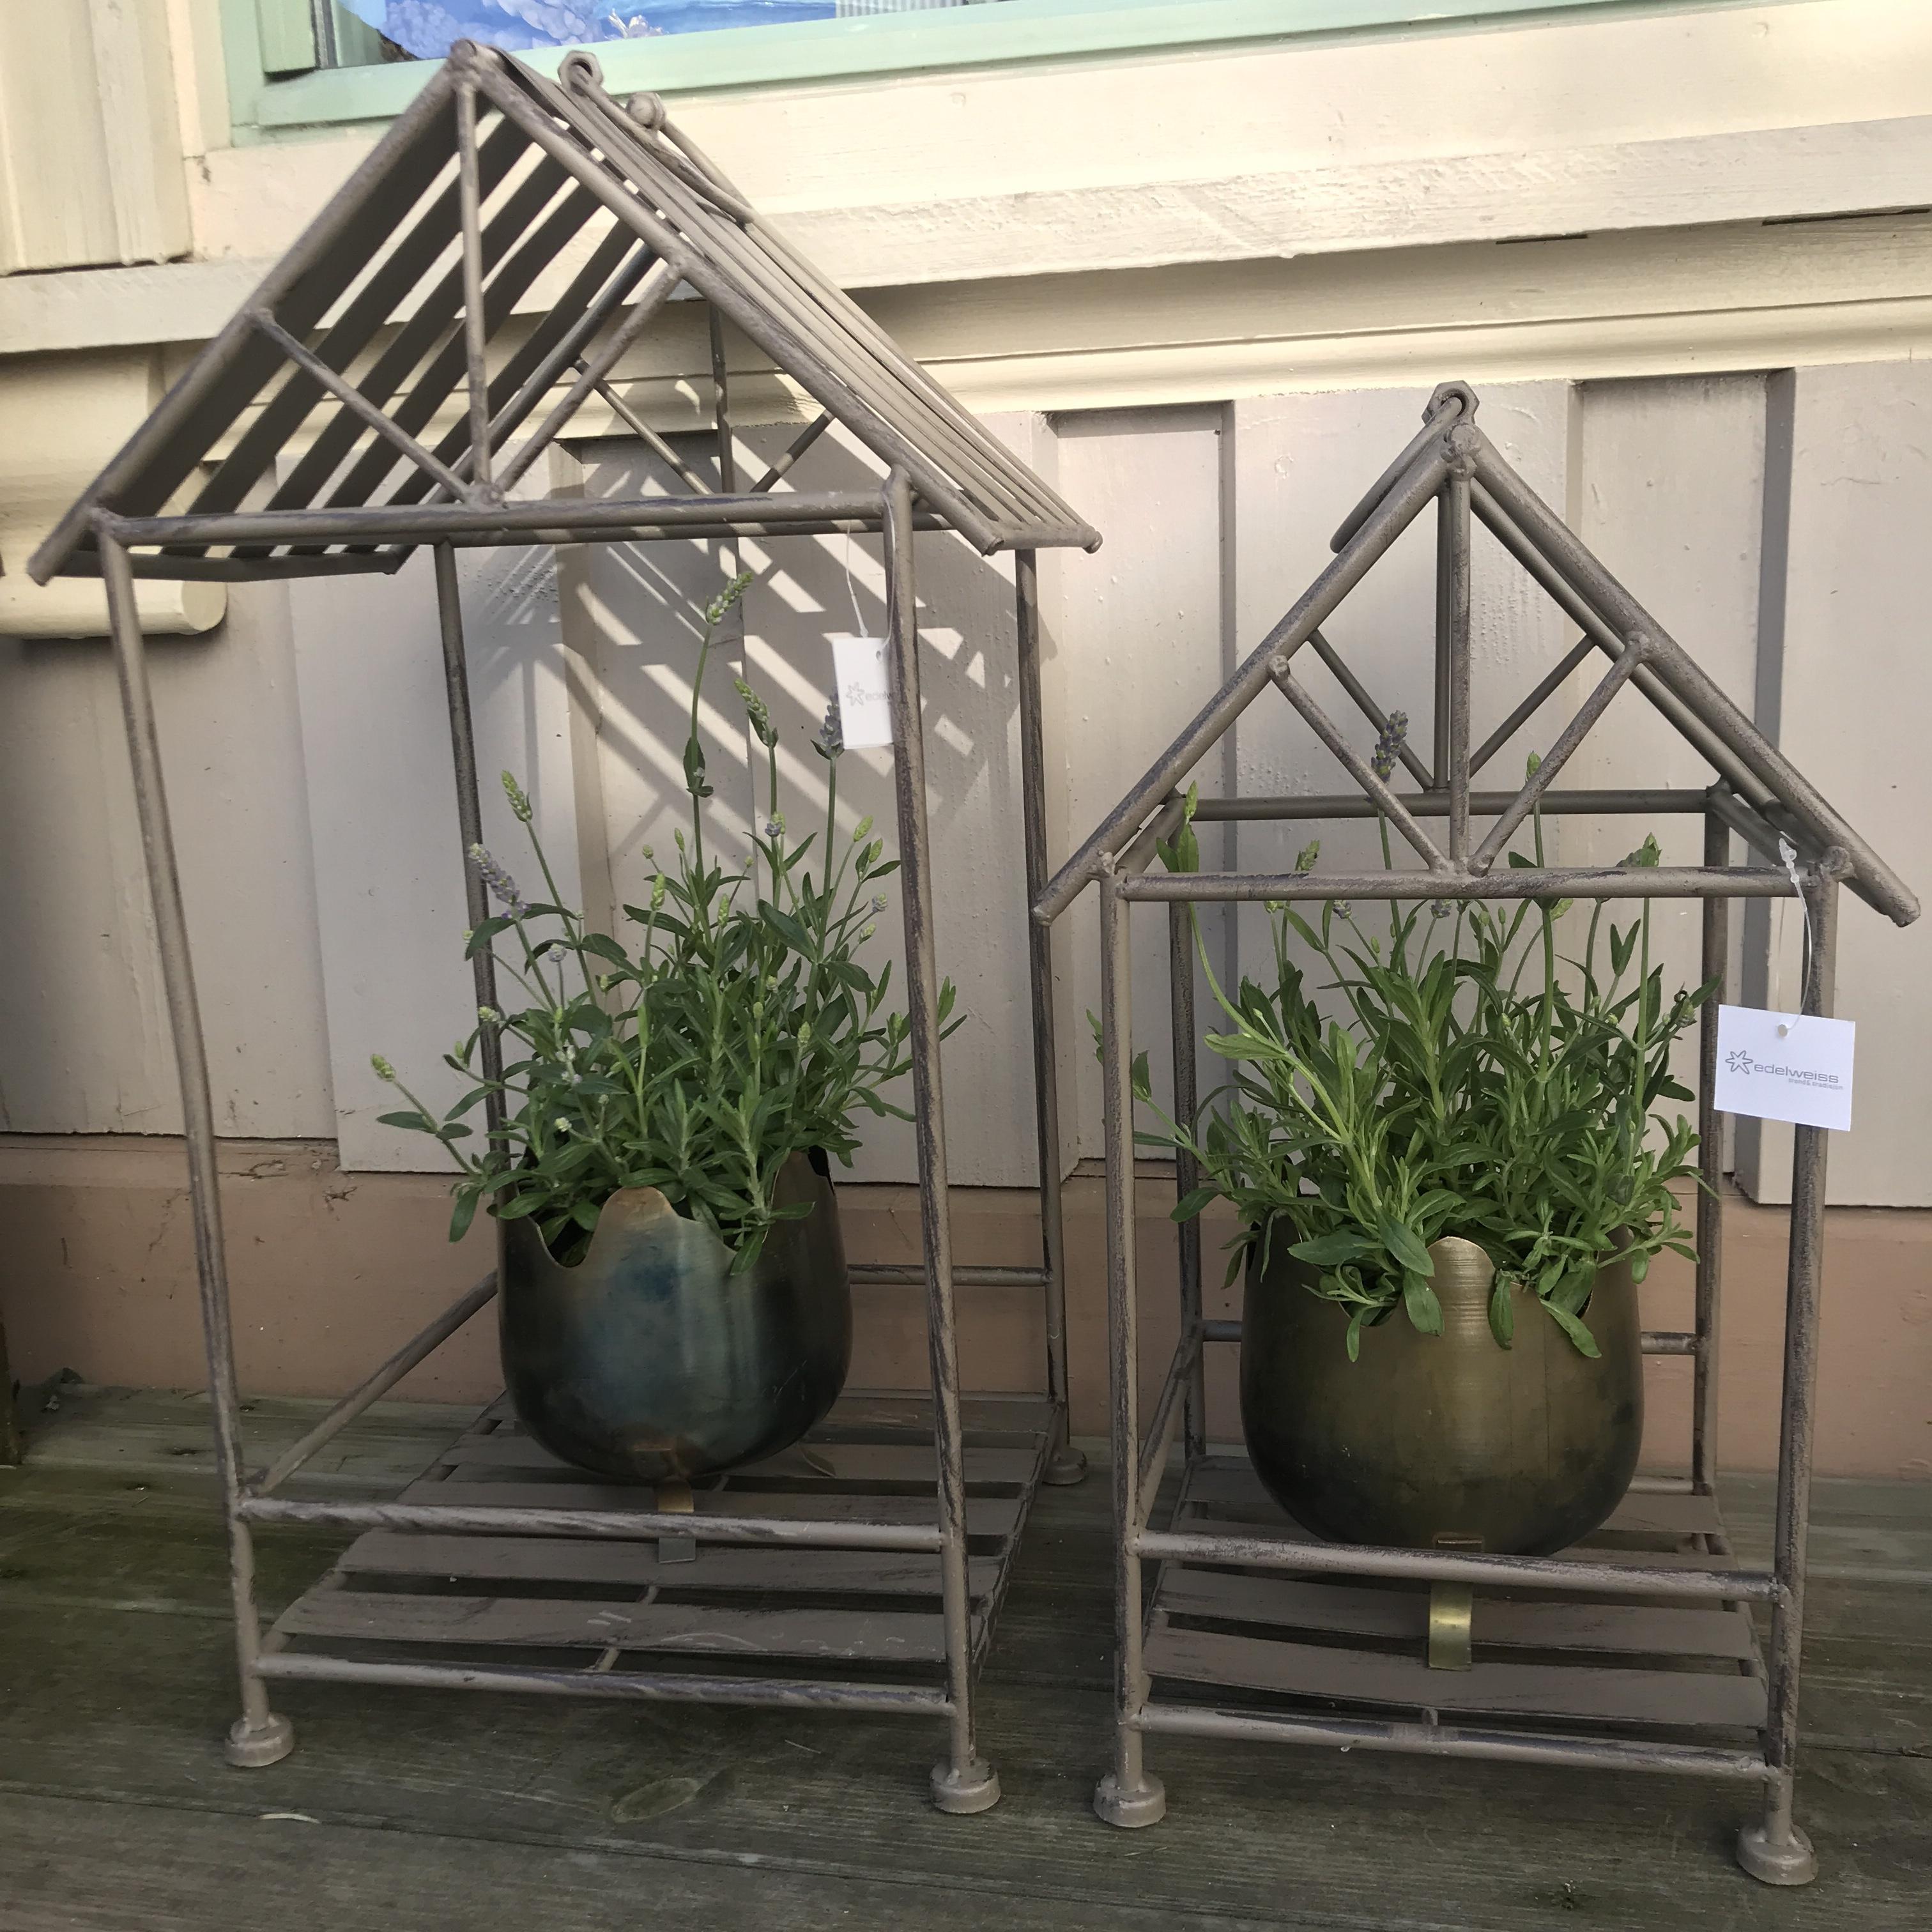 Wilfred : plantehus